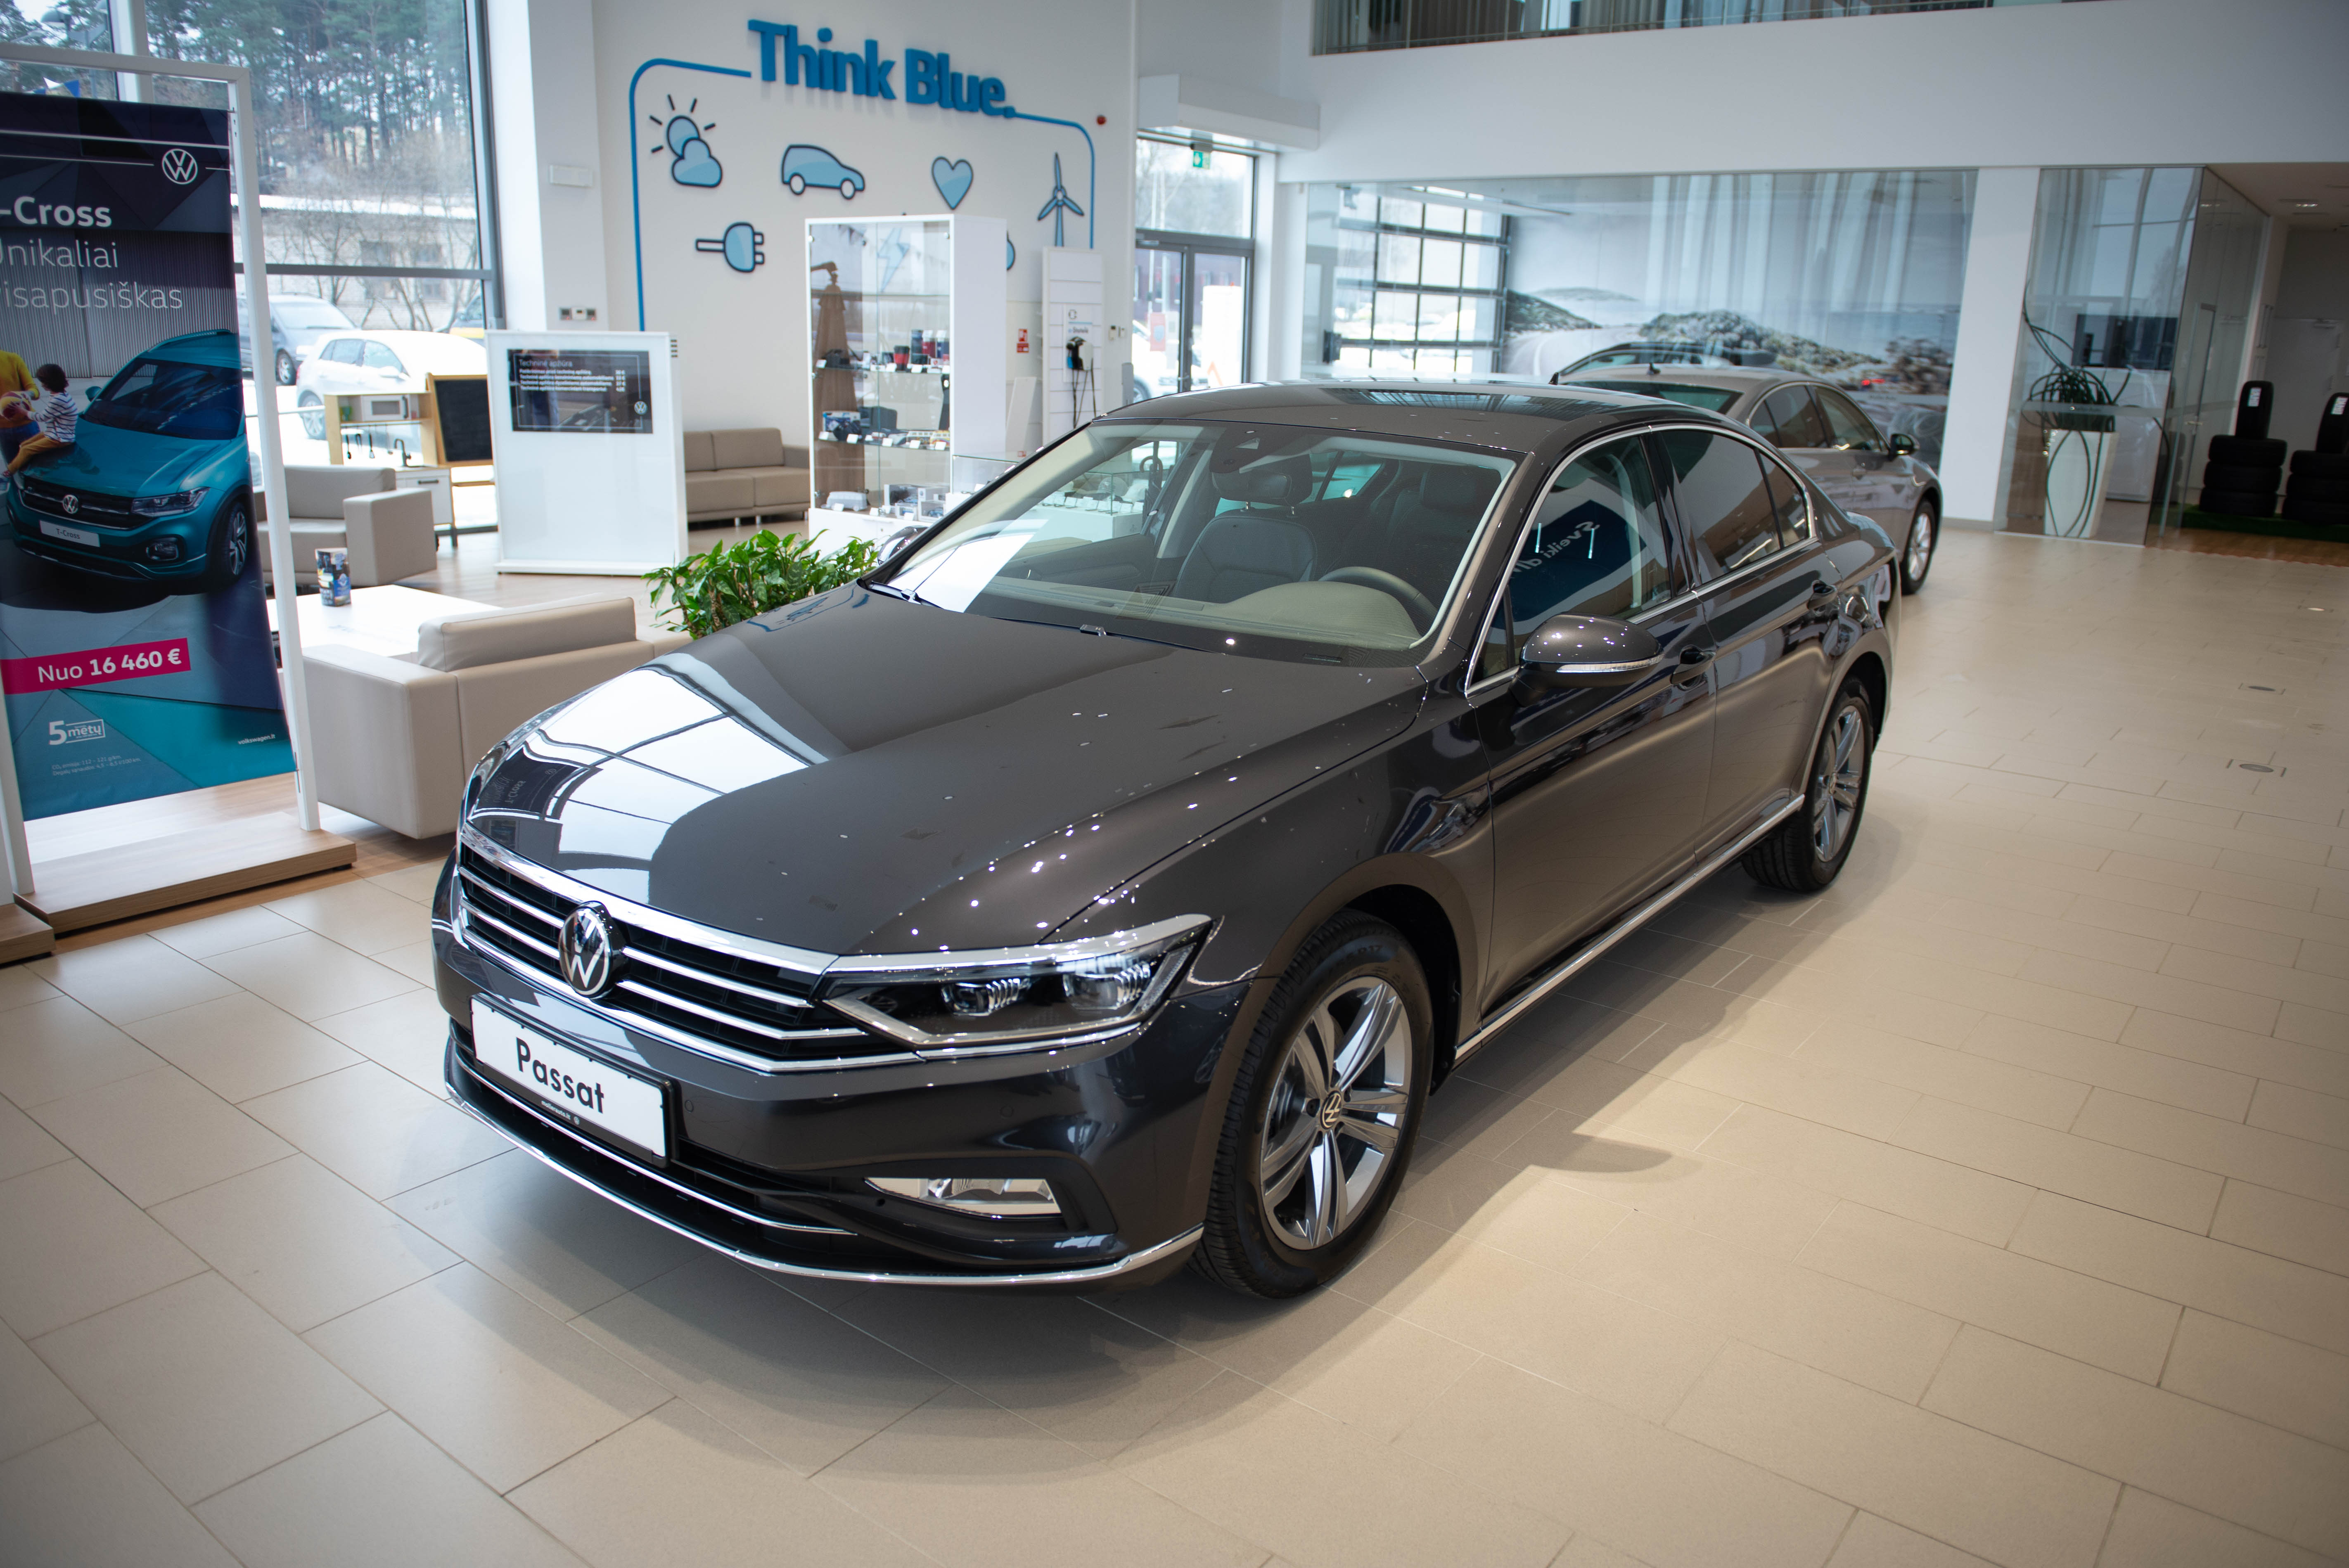 Volkswagen Passat Executive 1.5 TSI 150 AG DSG